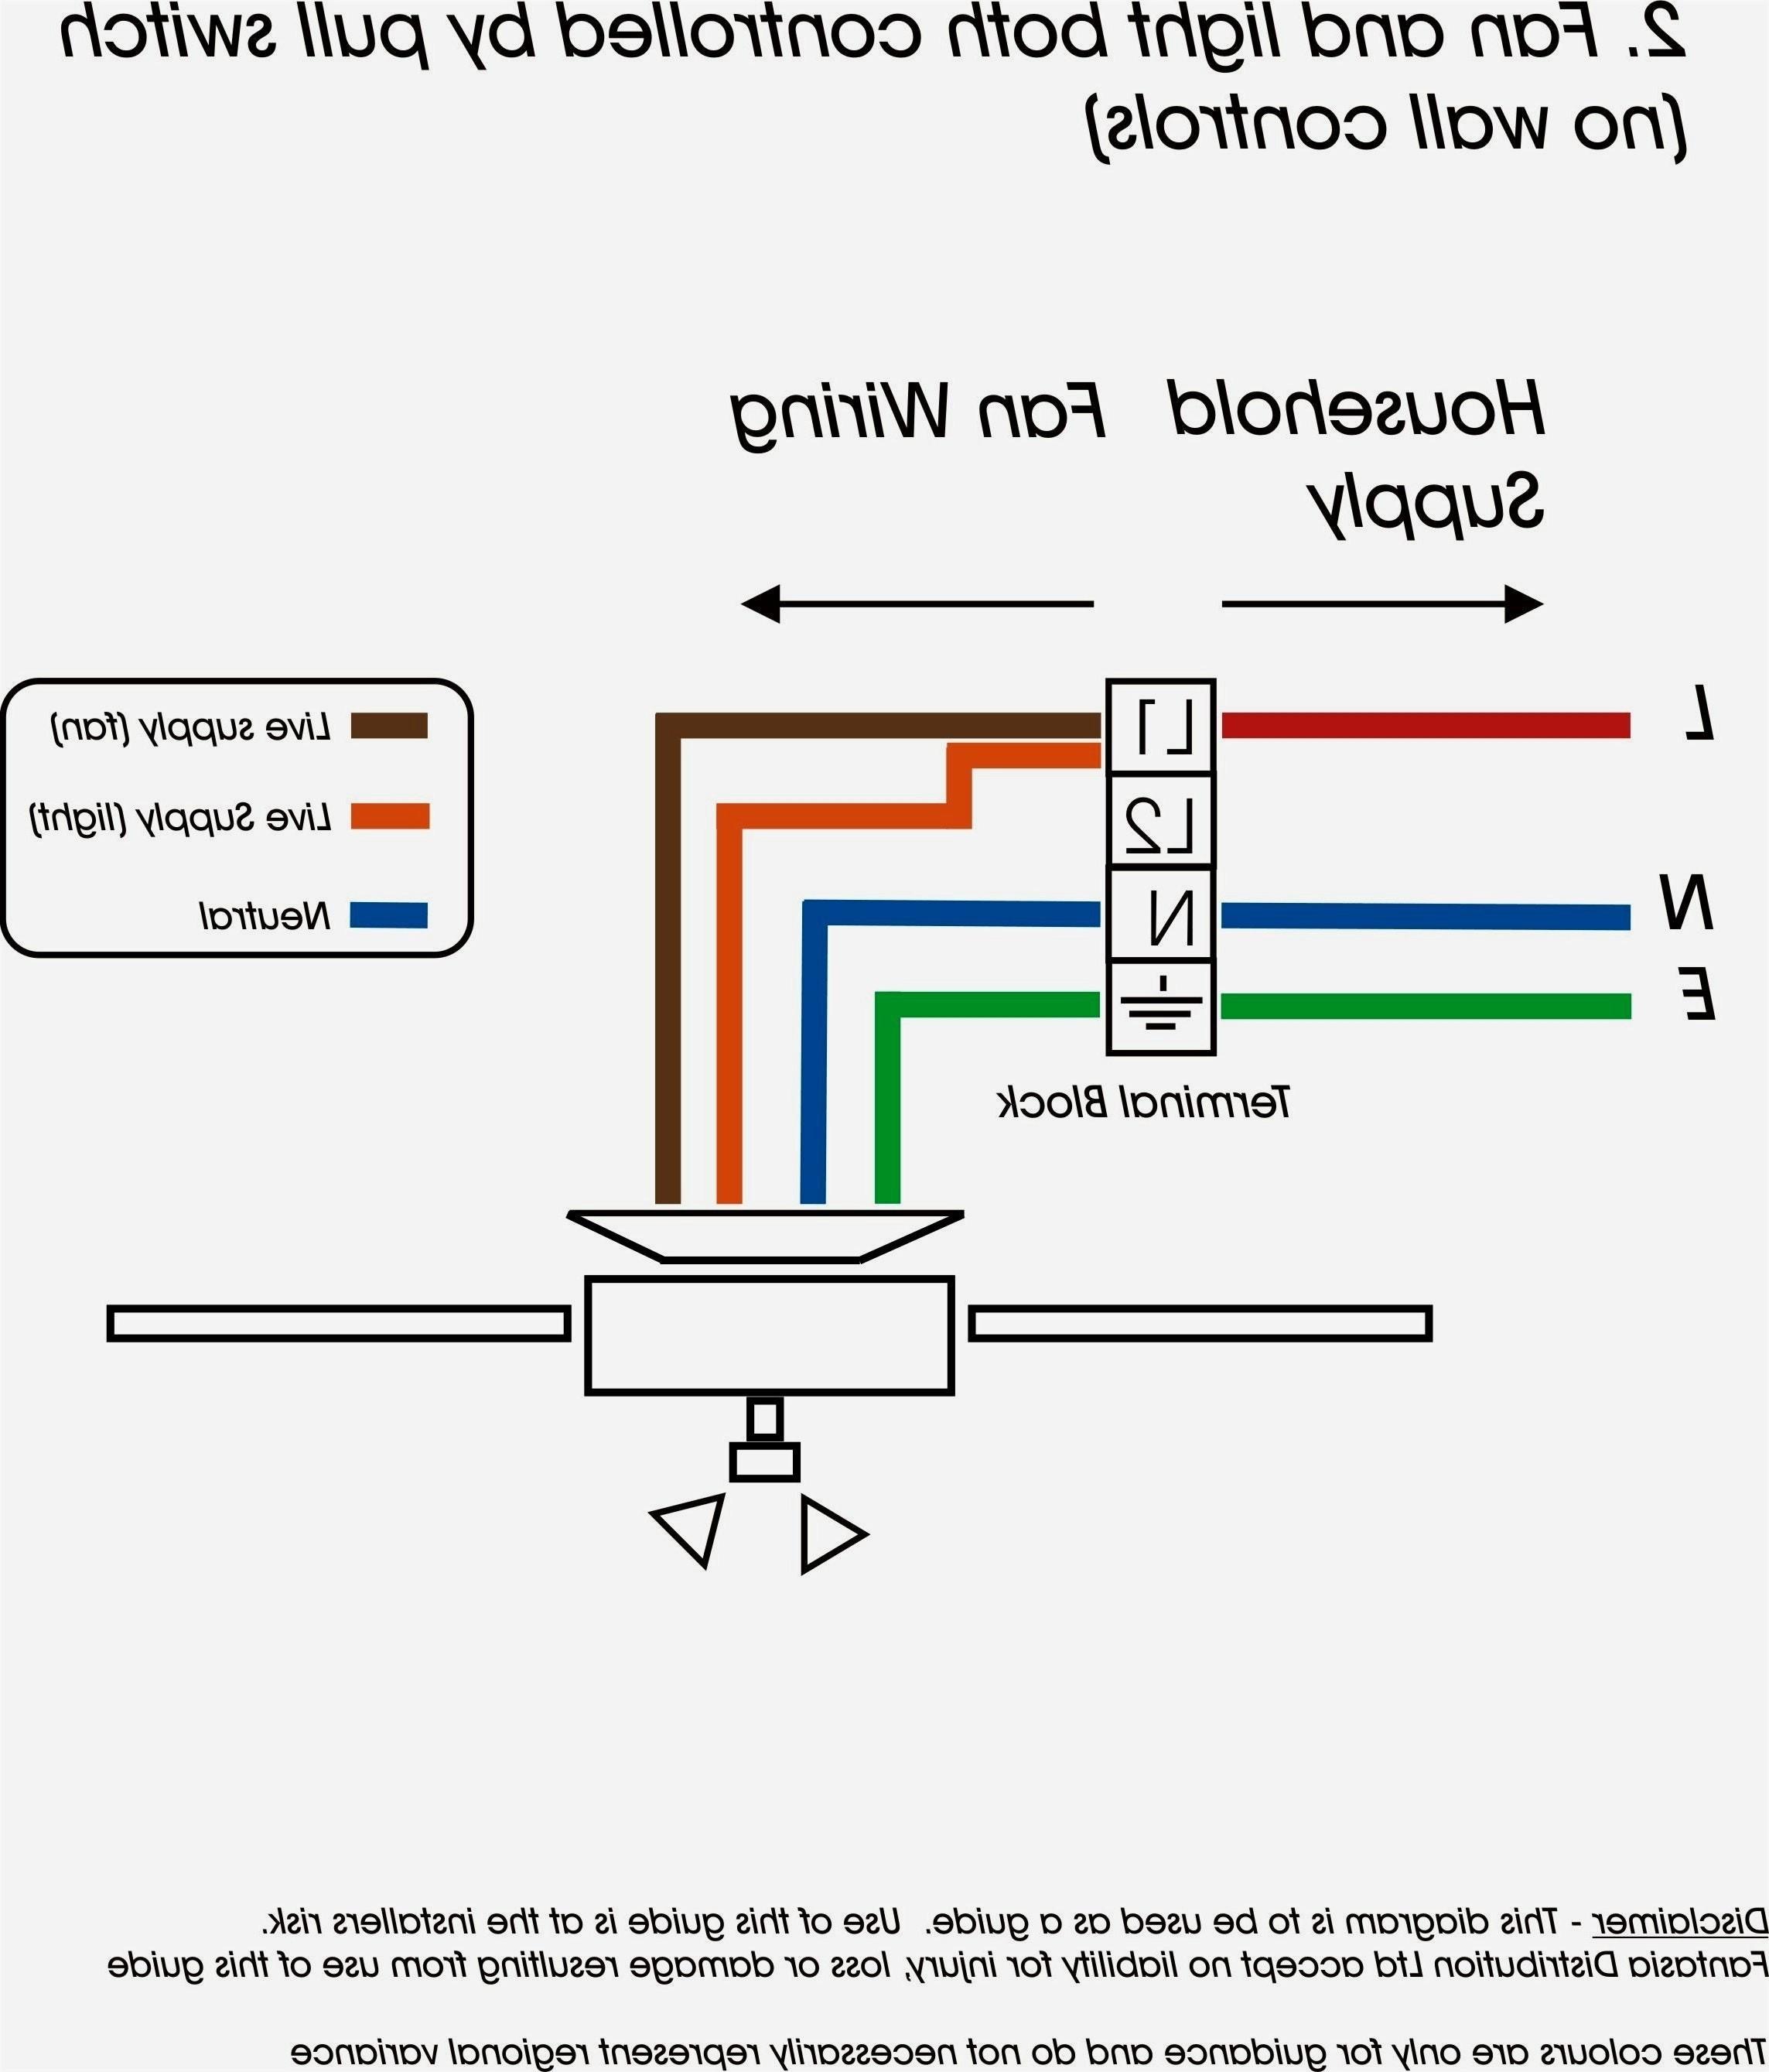 cat5 dsl wiring diagram Collection-Adsl Wiring Diagram Australia  Inspirationa Enchanting Phone Wiring Diagrams Motif